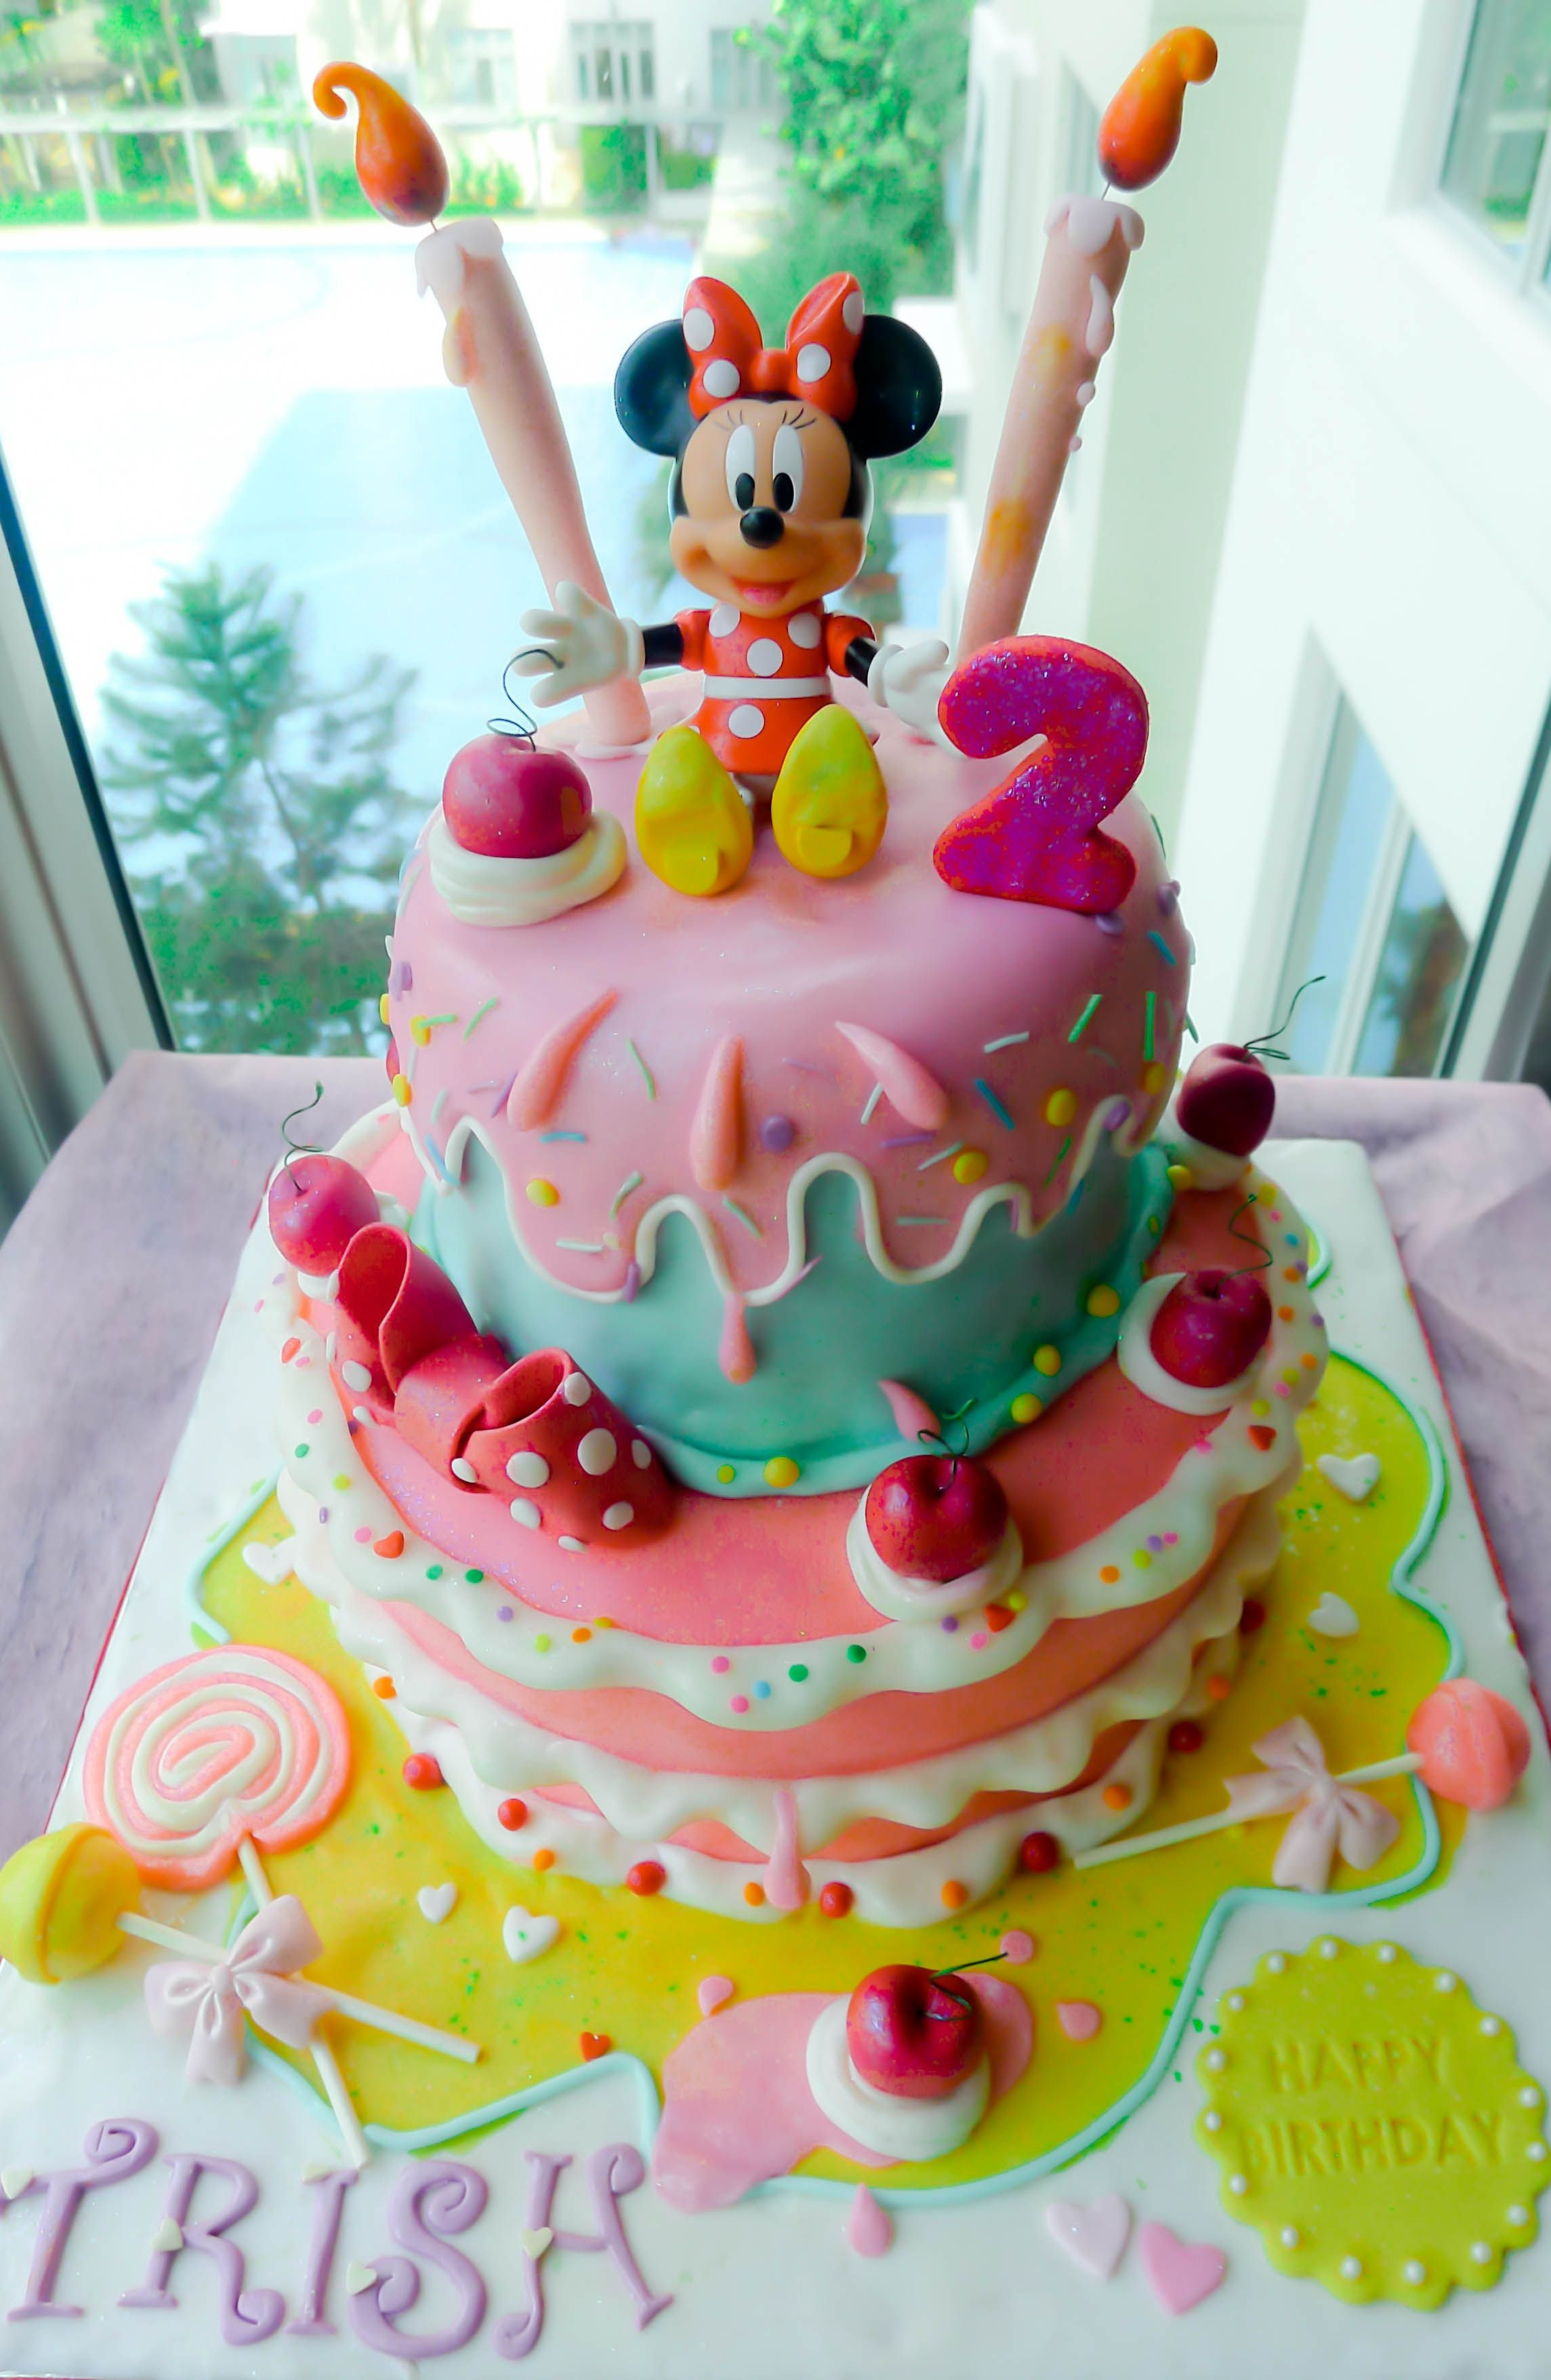 Minnie mouse cake cutest one Ive seen yet Magnifiques gteaux